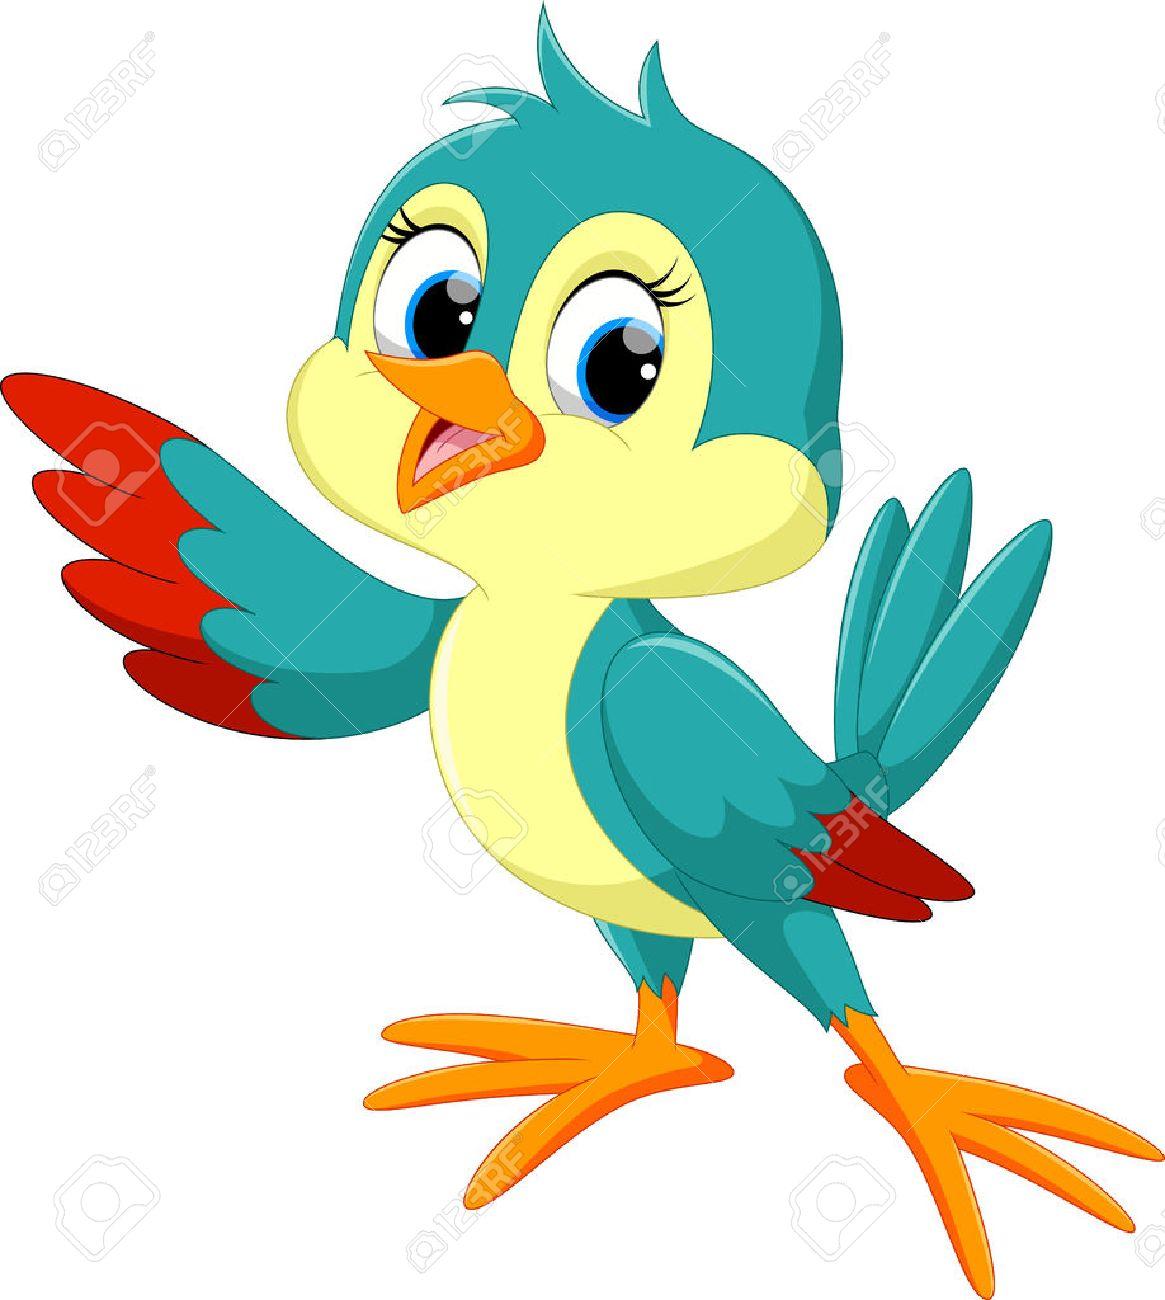 Cute bird cartoon - 55360473